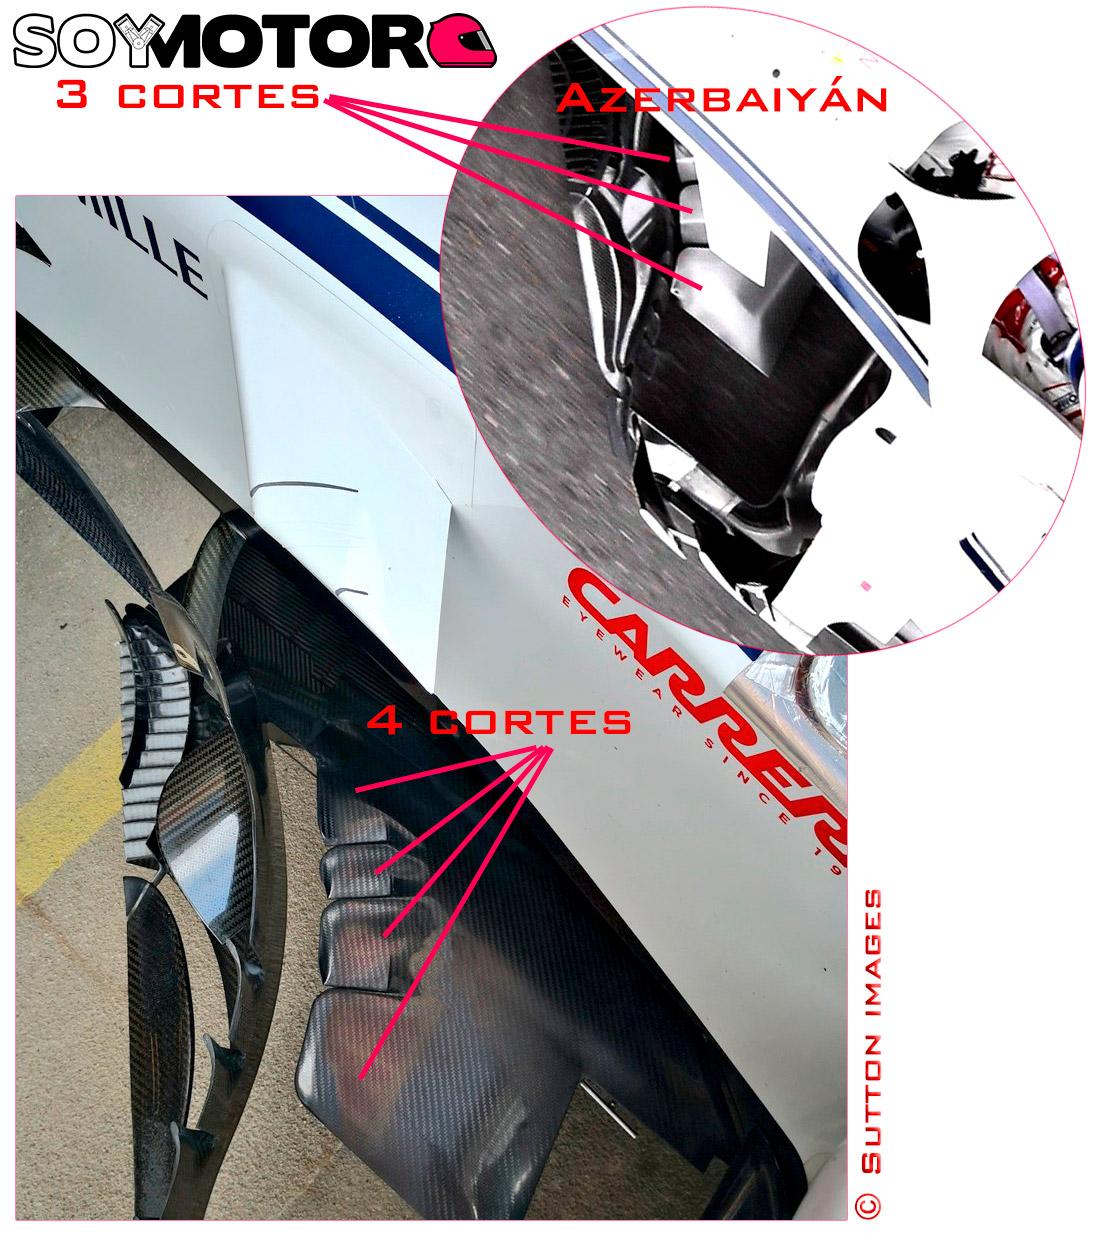 sauber-cortes-interior-bargeboard.jpg